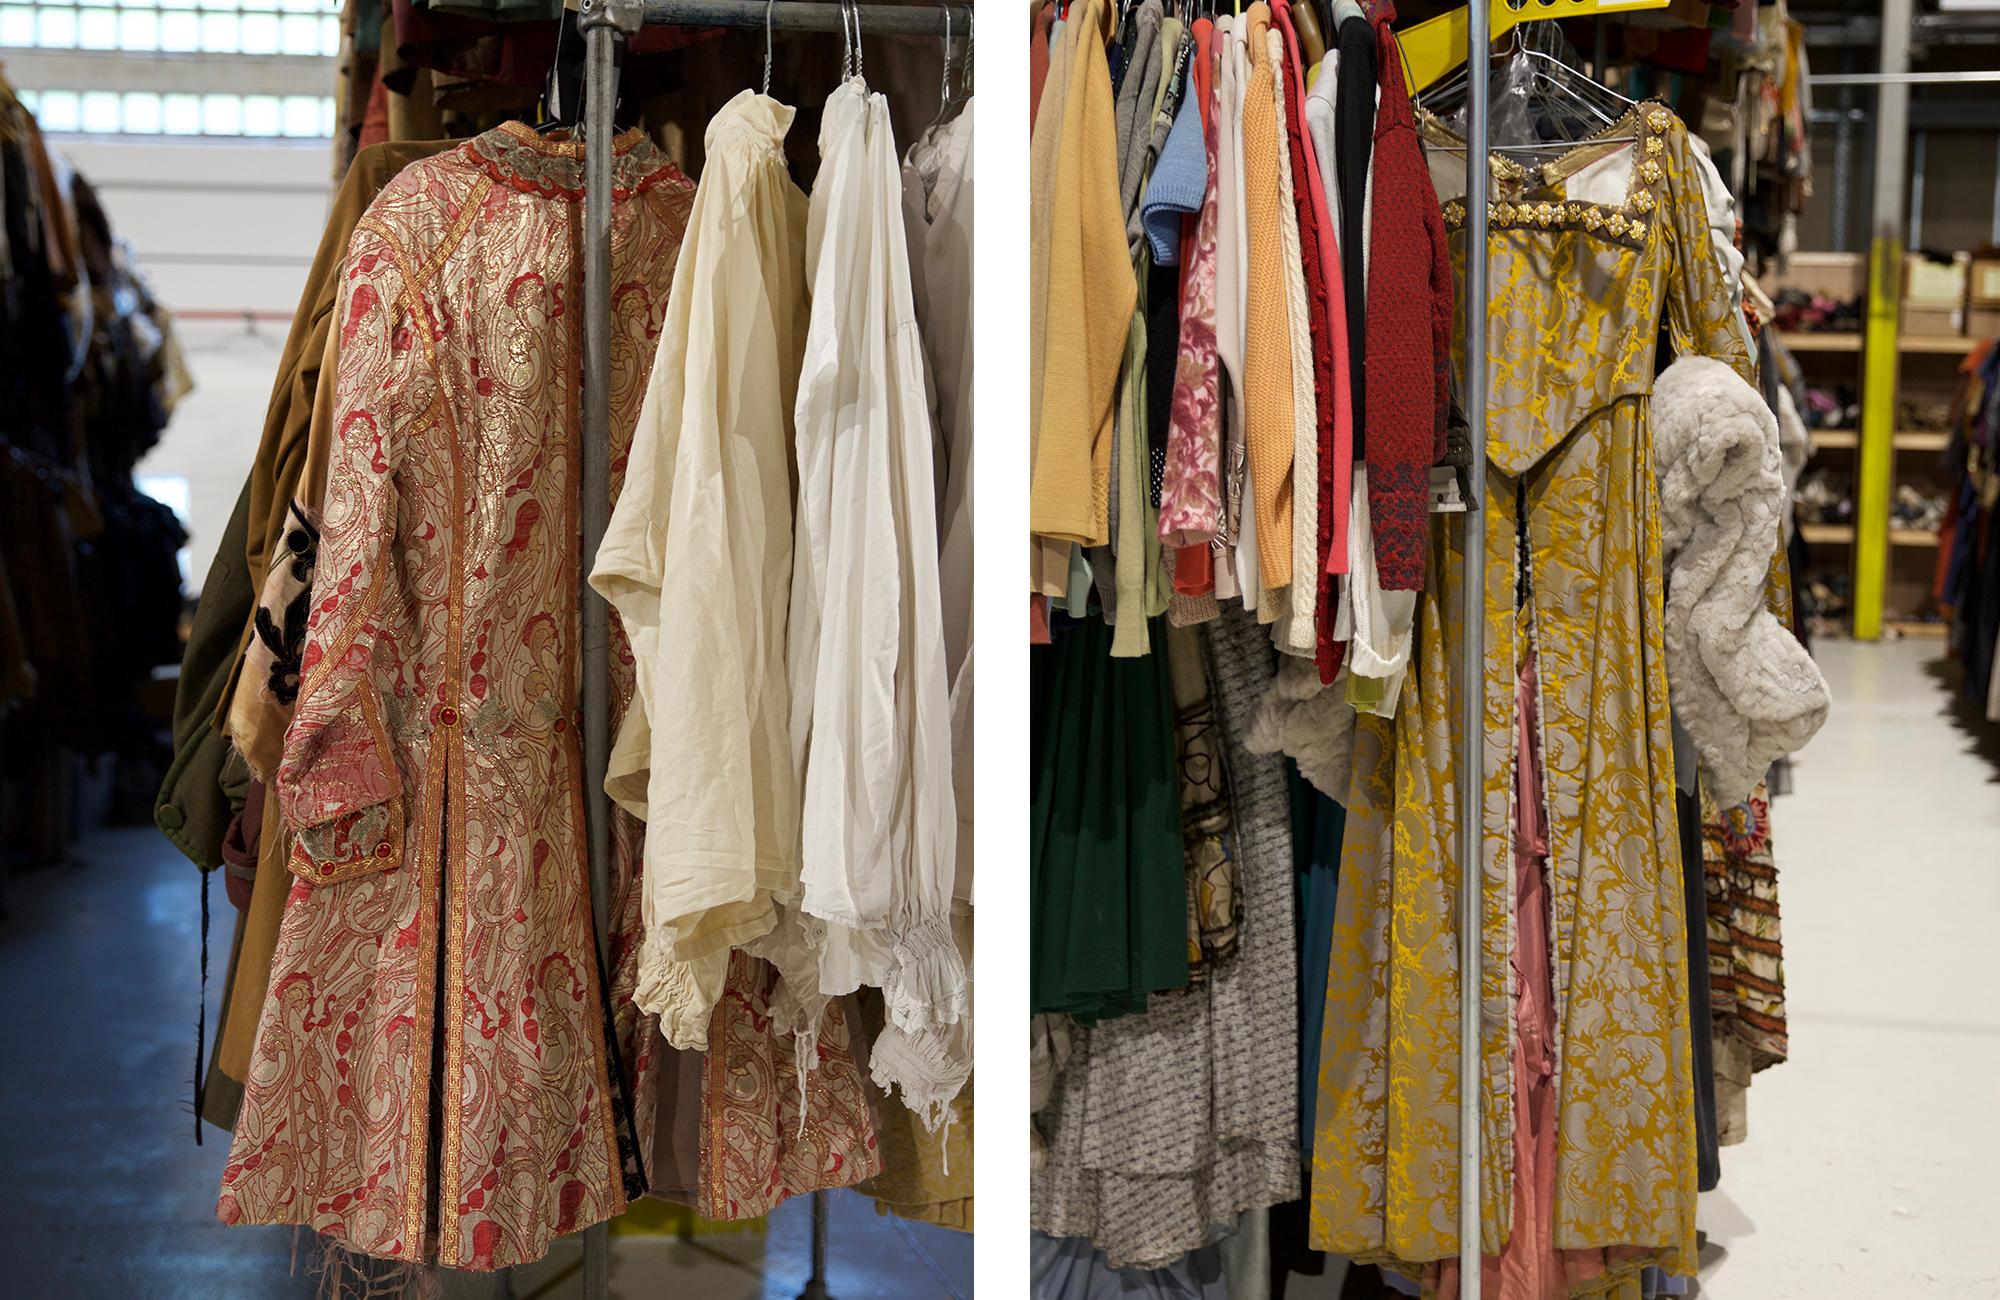 Elizabethan costumes - the racks go in chronological order